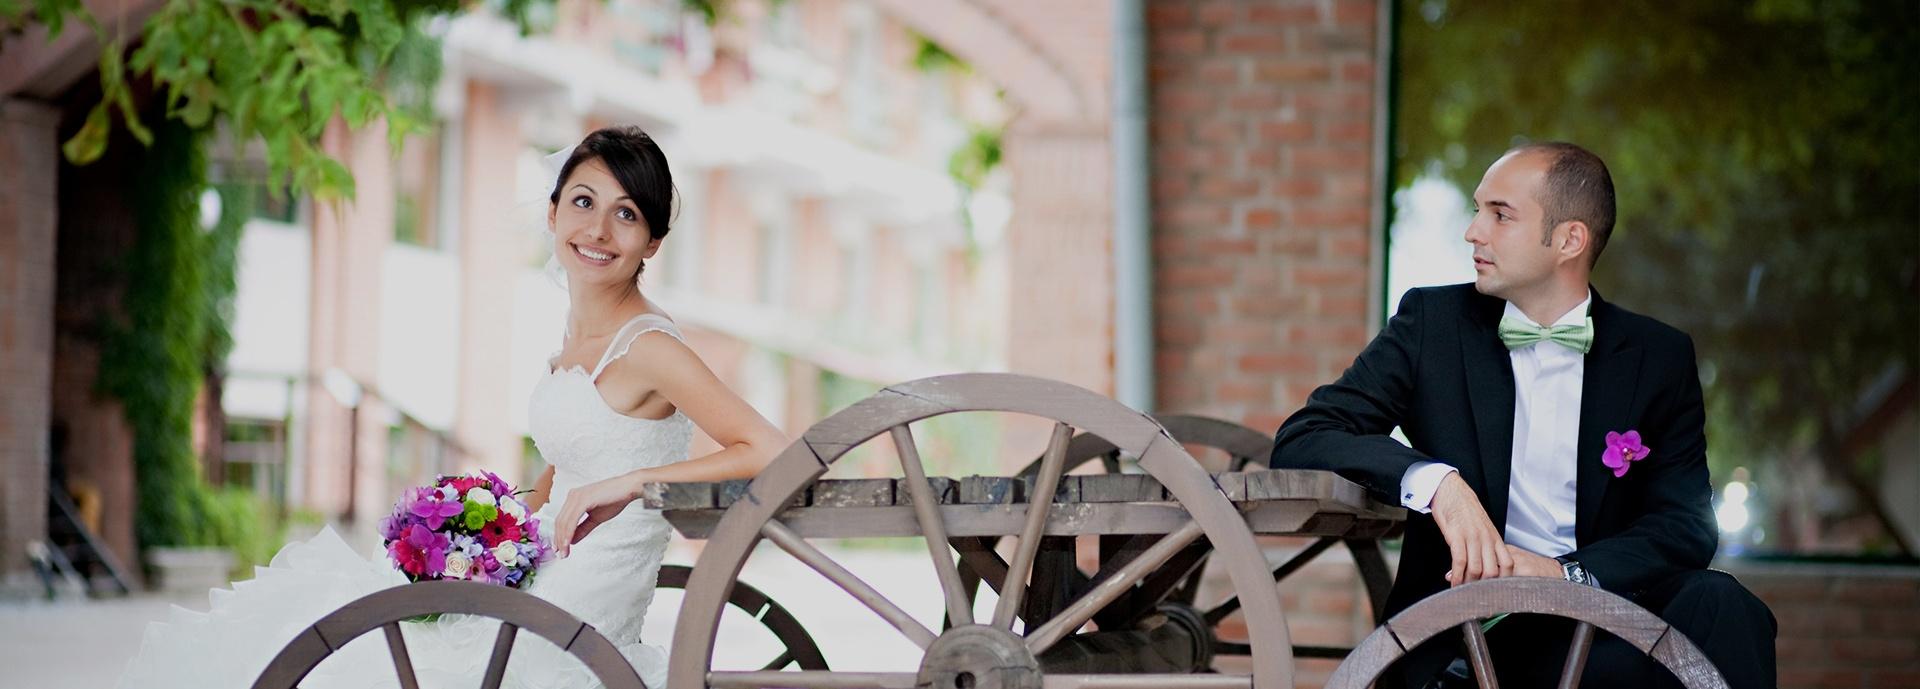 Nunta in gradina - Hotel Caro - Bucuresti